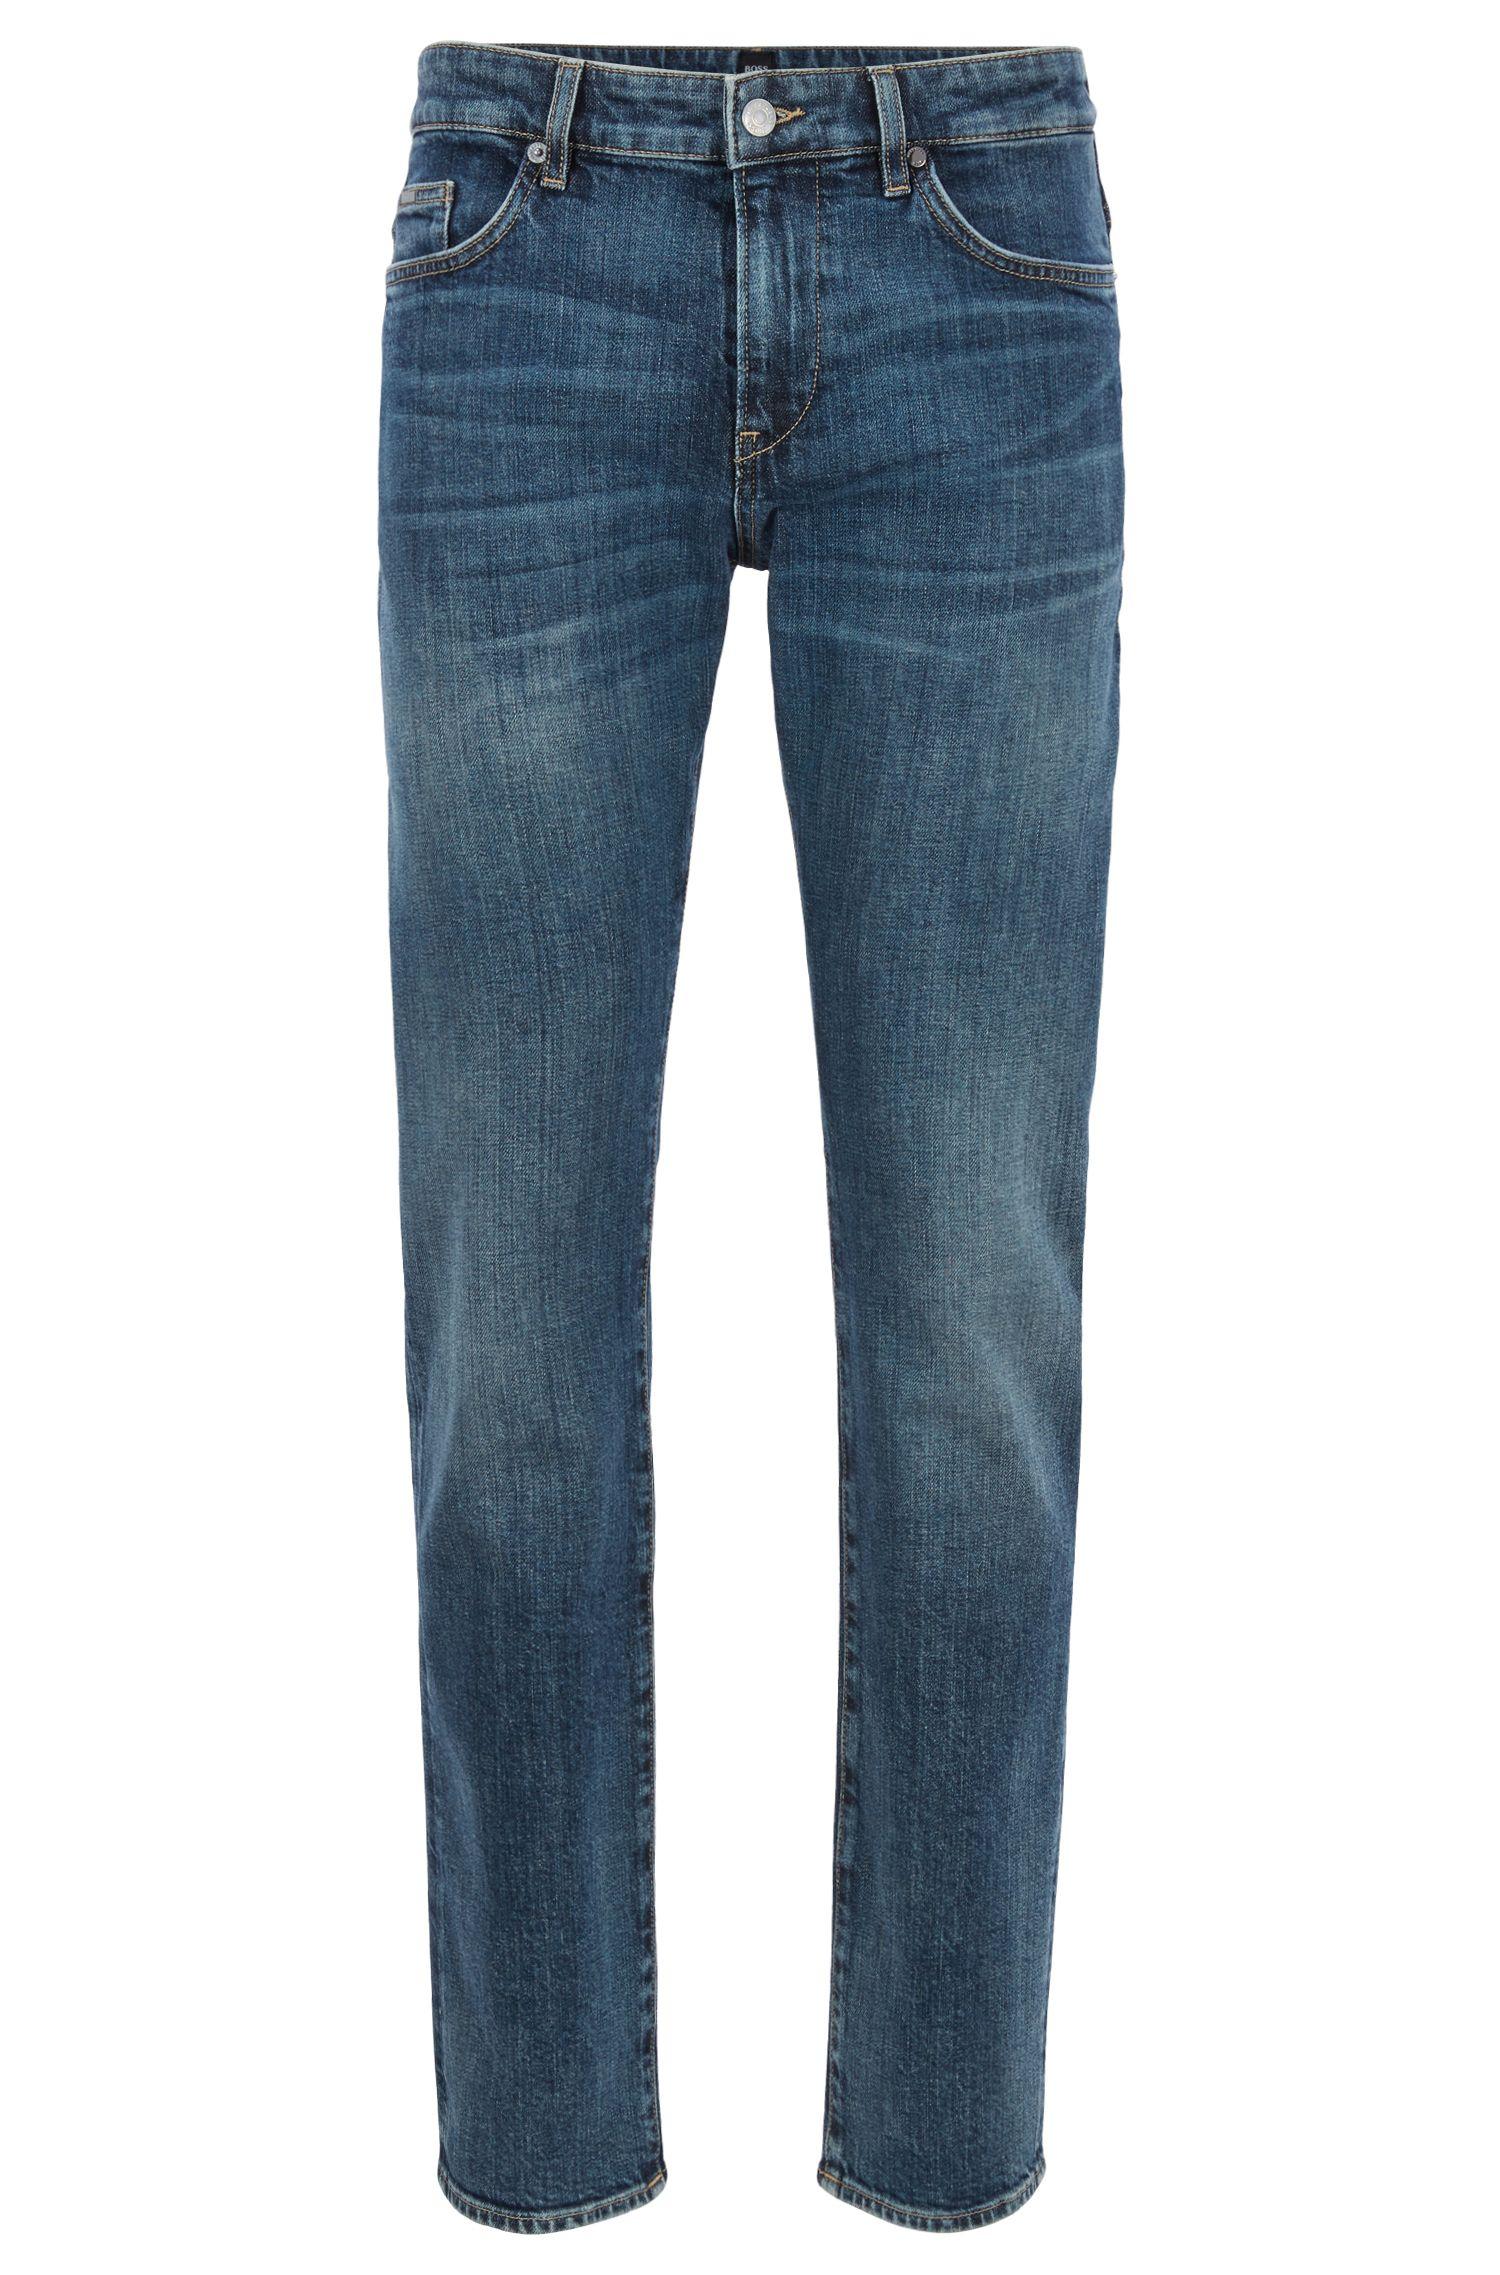 Green-cast slim-fit jeans in Italian BCI denim, Blue